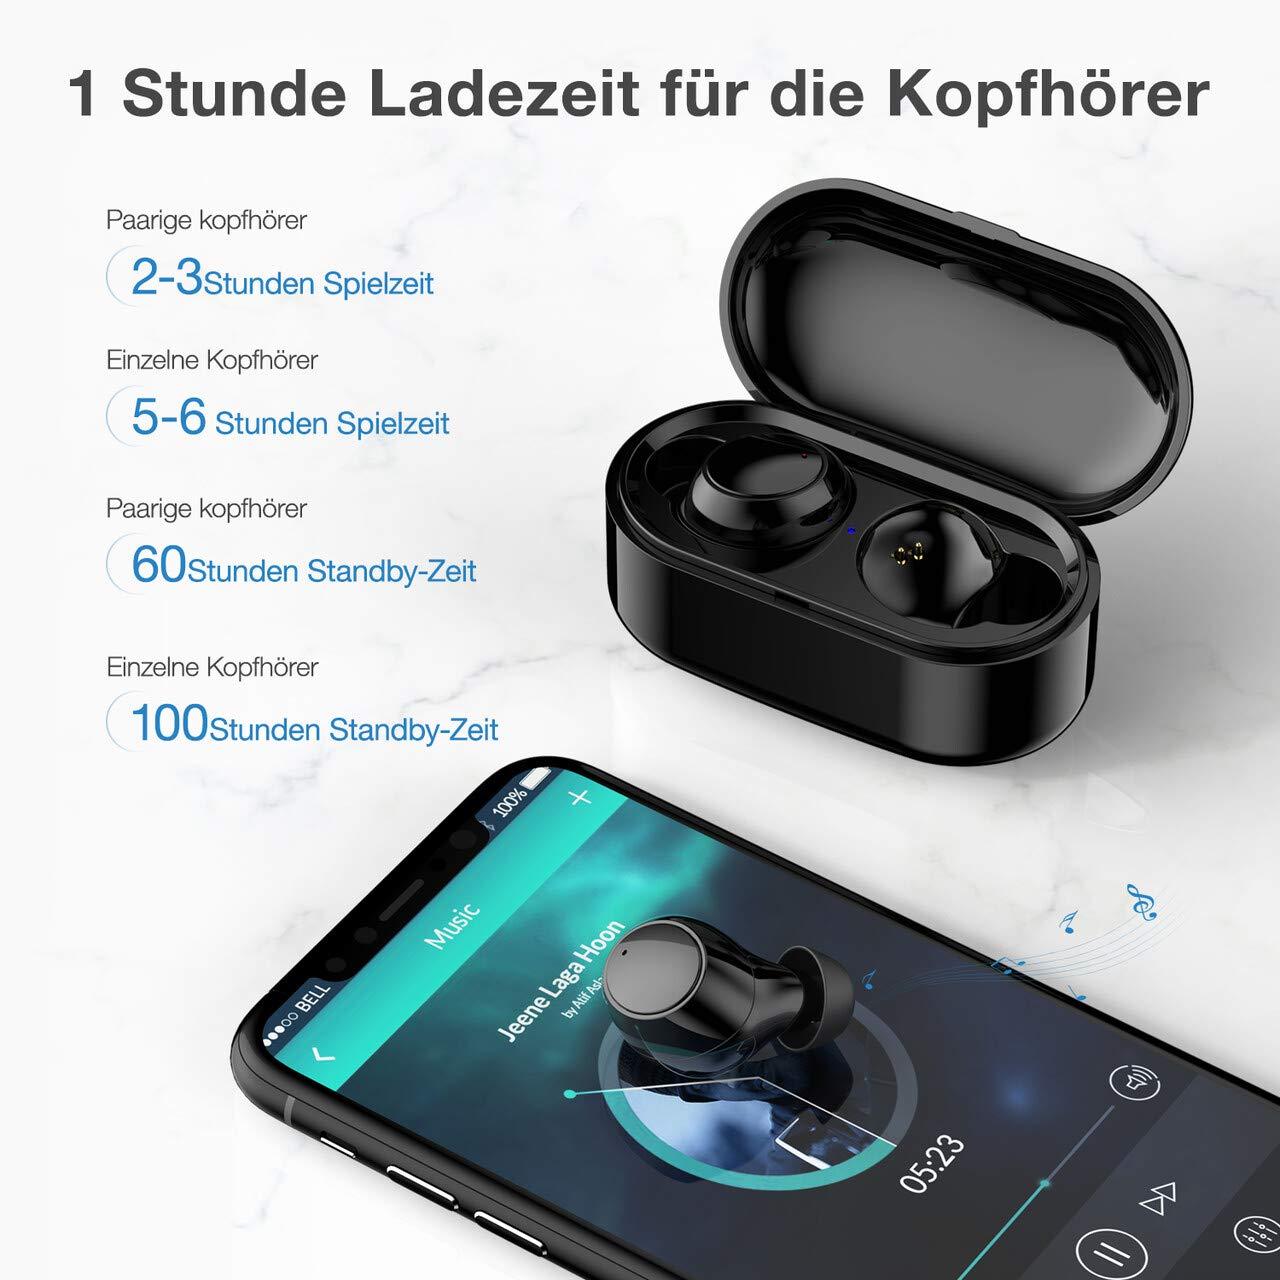 POWERADD Bluetooth Kopfhörer 5.0 Sport Kopfhörer TWS In-Ear Ohrhörer mit CVC 6.0 EDR Technik IPX5 wasserdichter Grad und Integriertem Mikrofon